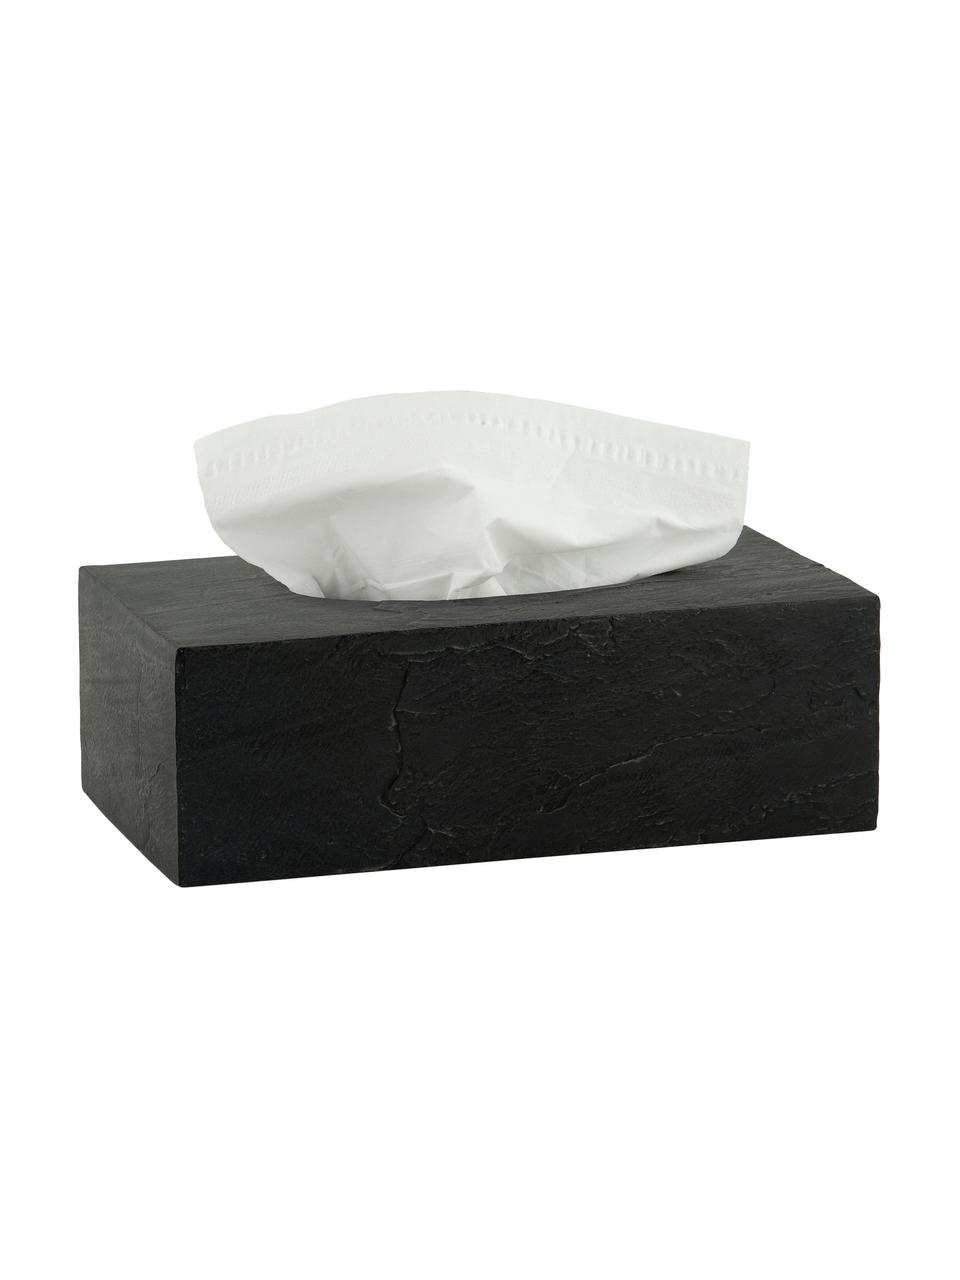 Kosmetiktuchbox Slate, Polyresin, Schwarz, 26 x 9 cm